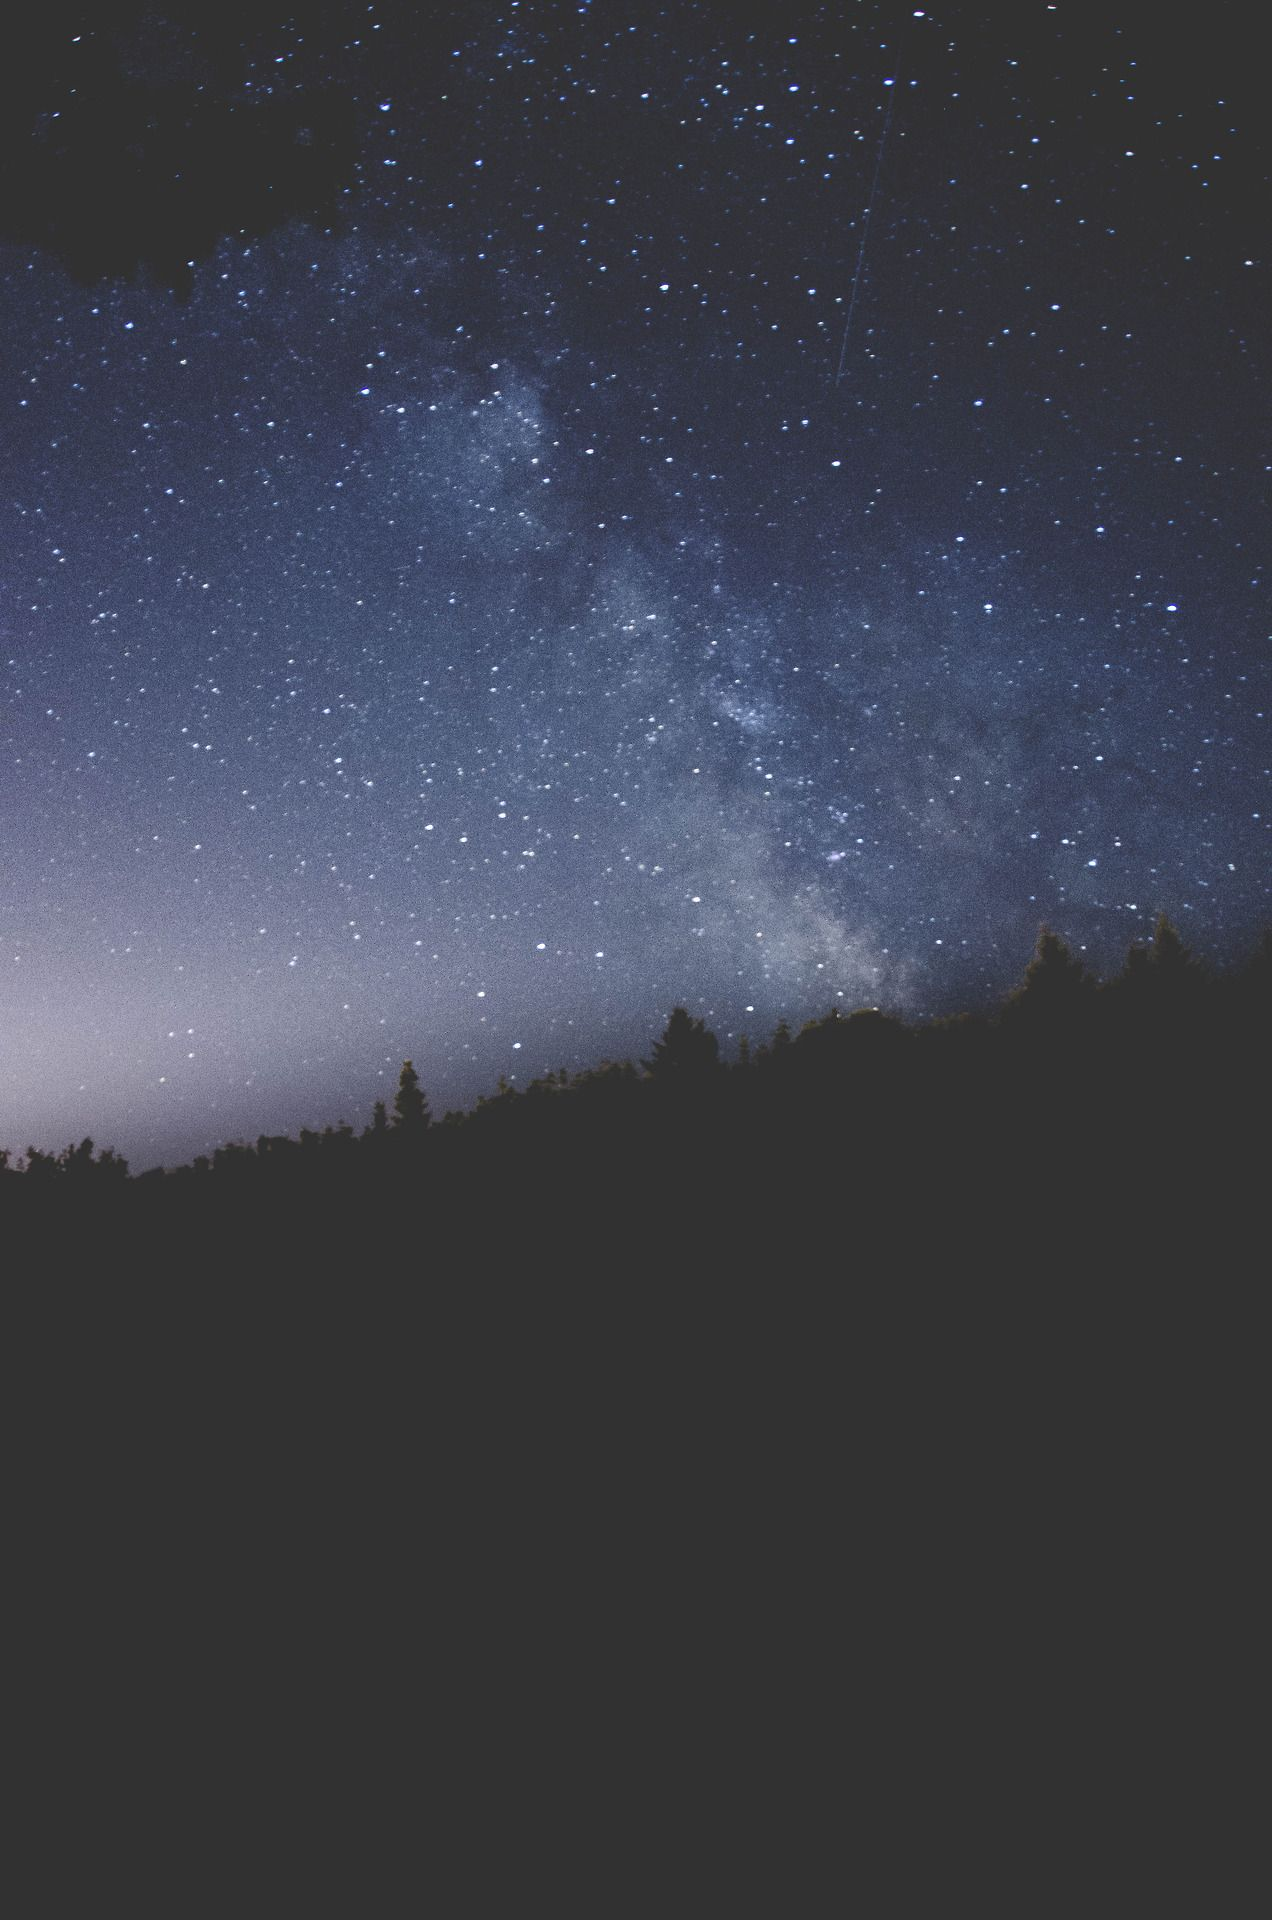 Pin By Maya Kawachi On To Enjoy The Little Things Happy Life Architect Night Skies Sky Sky Full Of Stars